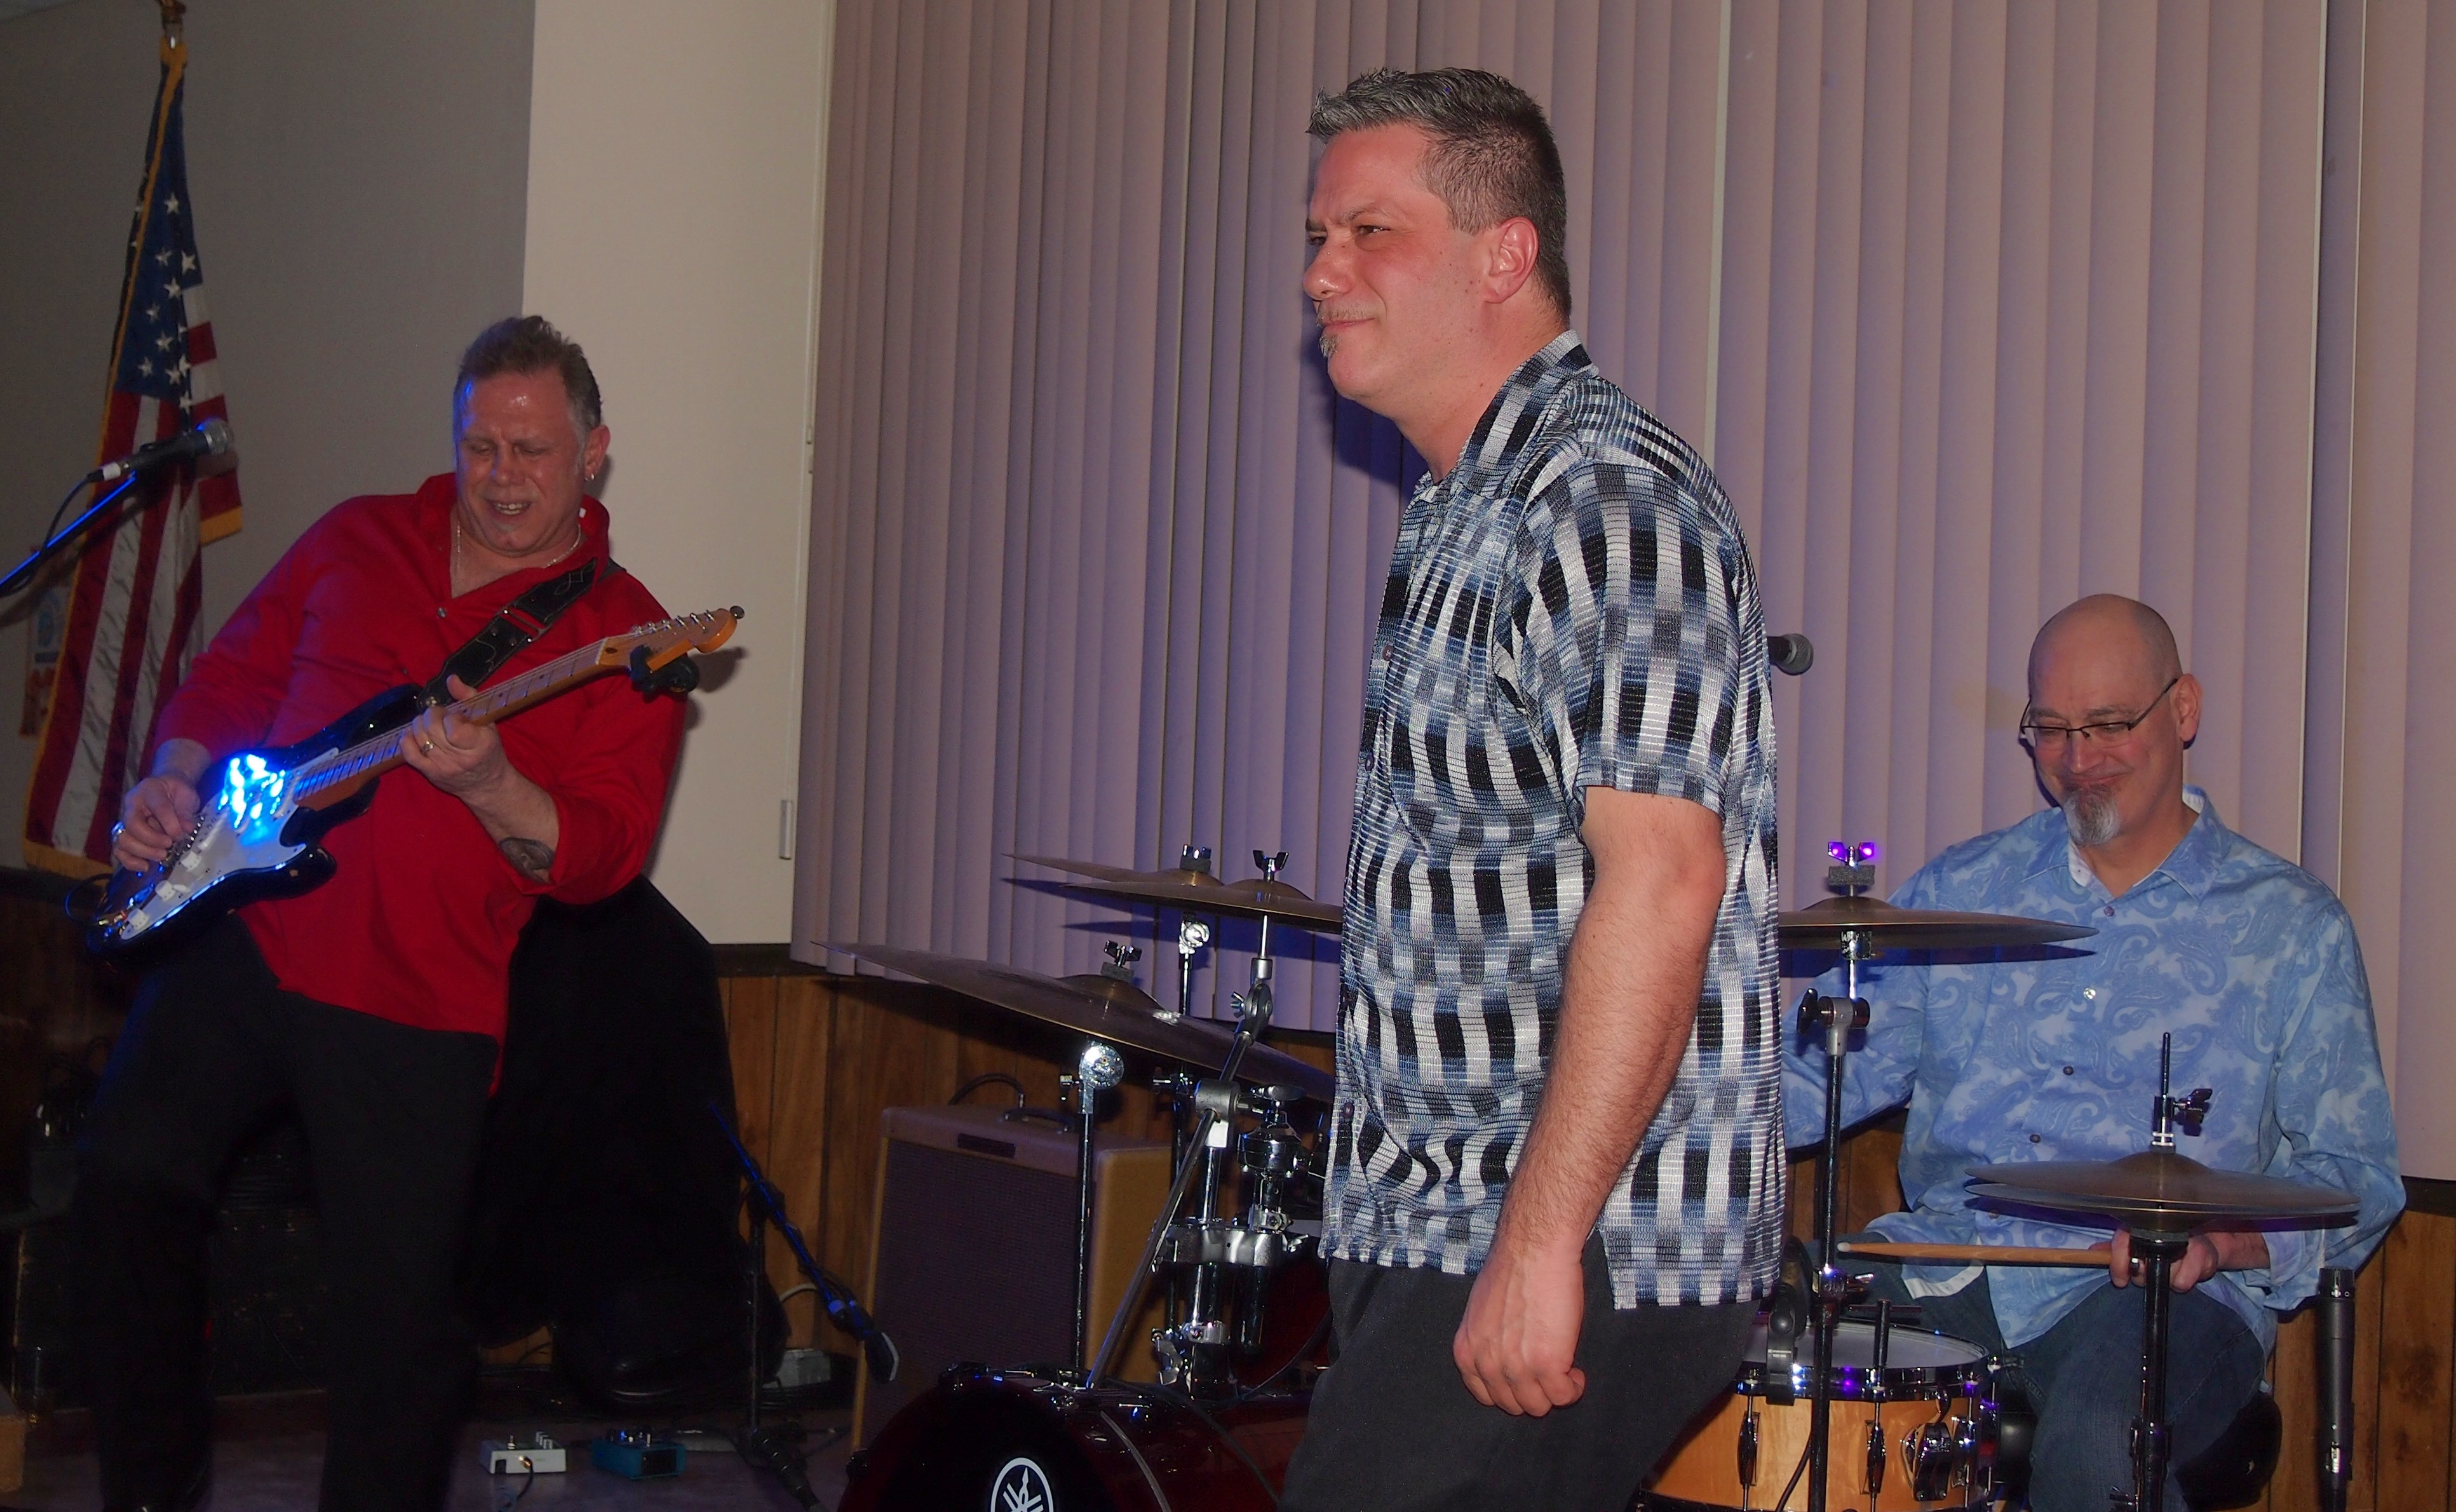 Carl Ricci 706 Union Band with Drew Blood7x